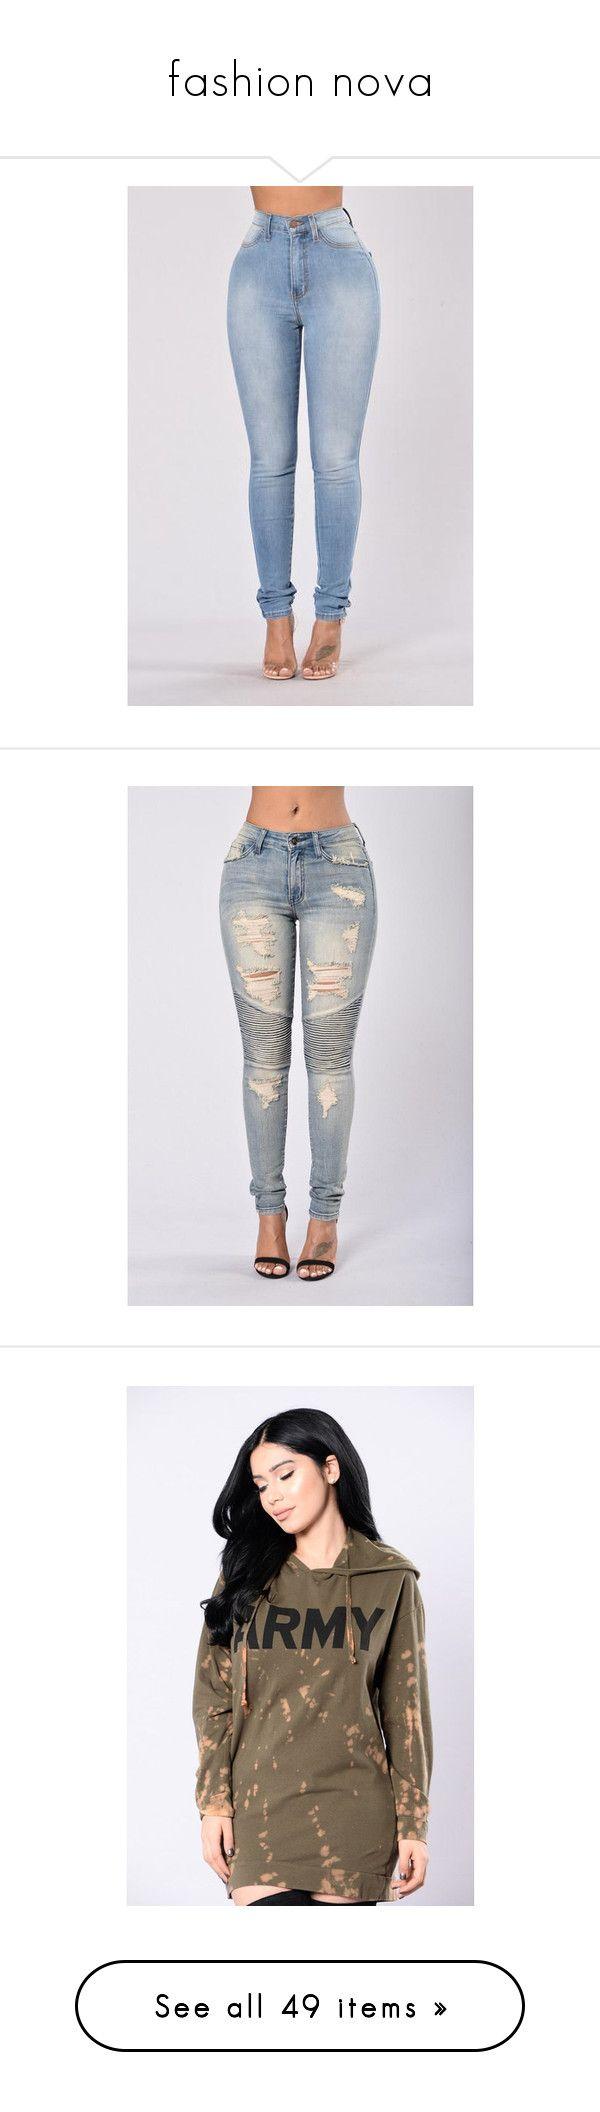 """fashion nova"" by carlinsaige ❤ liked on Polyvore featuring jeans, pants, fashion nova, bottoms, blue skinny jeans, light blue high waisted jeans, high rise skinny jeans, light blue skinny jeans, denim skinny jeans and tops"